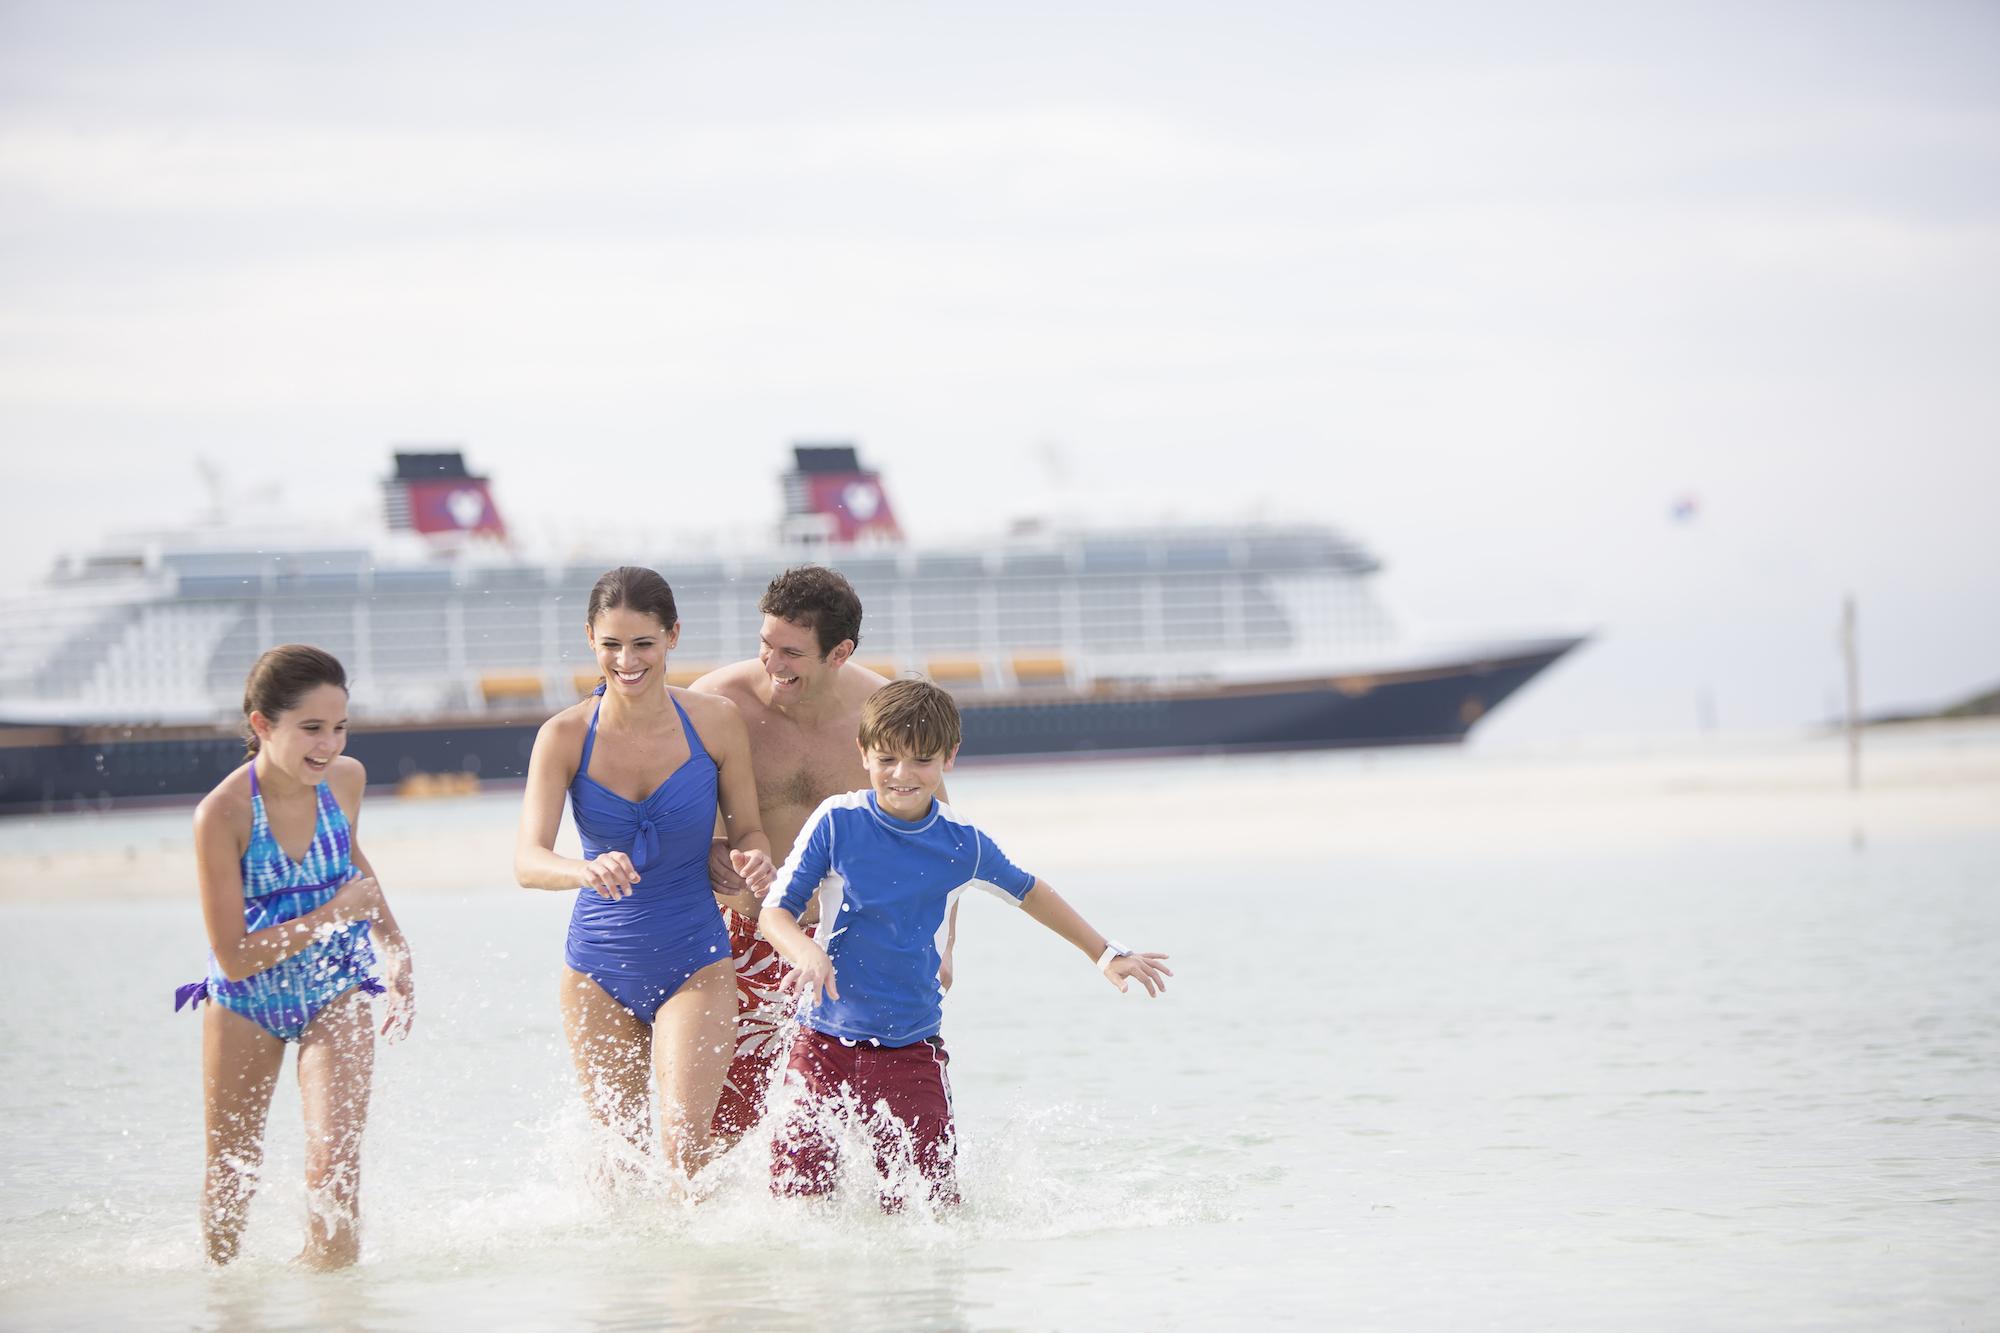 disney-cruise-line-ship-beach-castaway